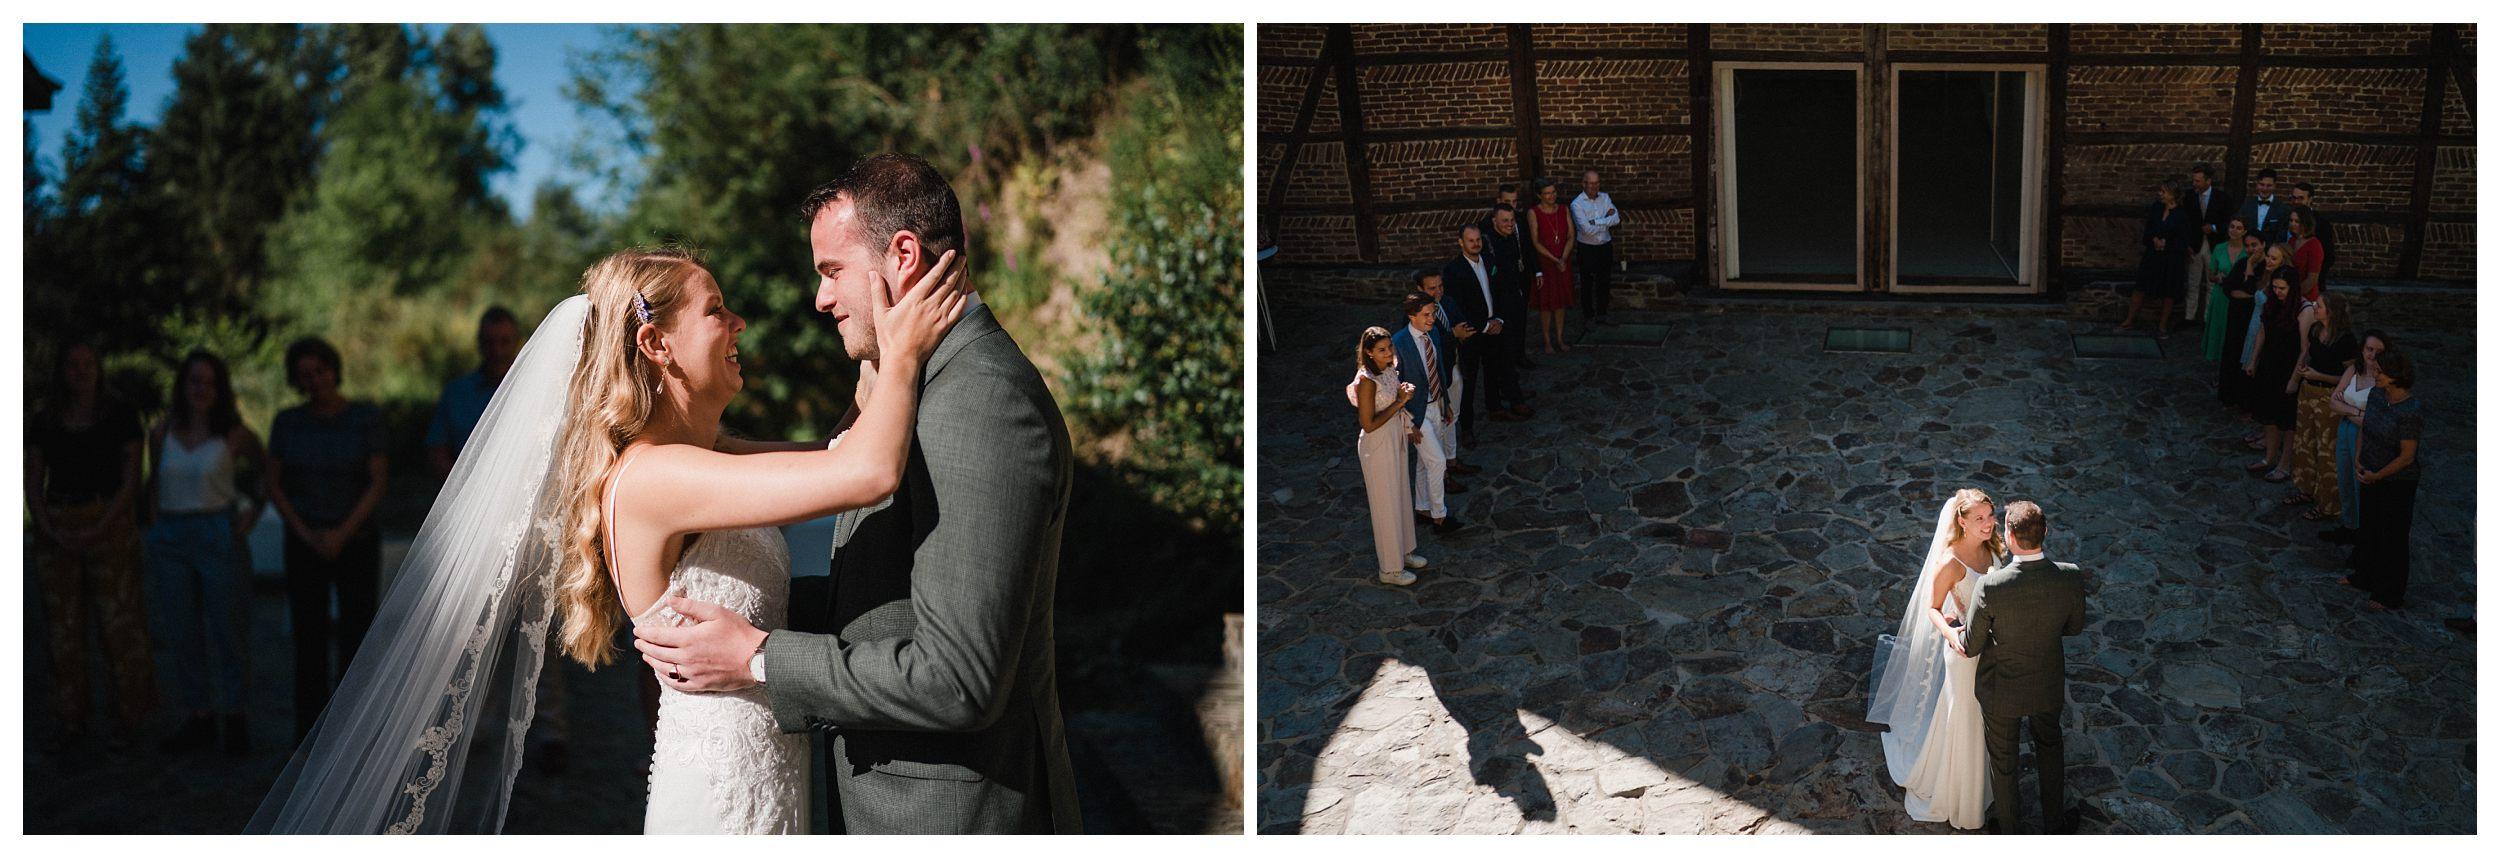 huwelijksfotograaf bruidsfotograaf destinationwedding huwelijksfotografie in ardennen nederland (23).jpg